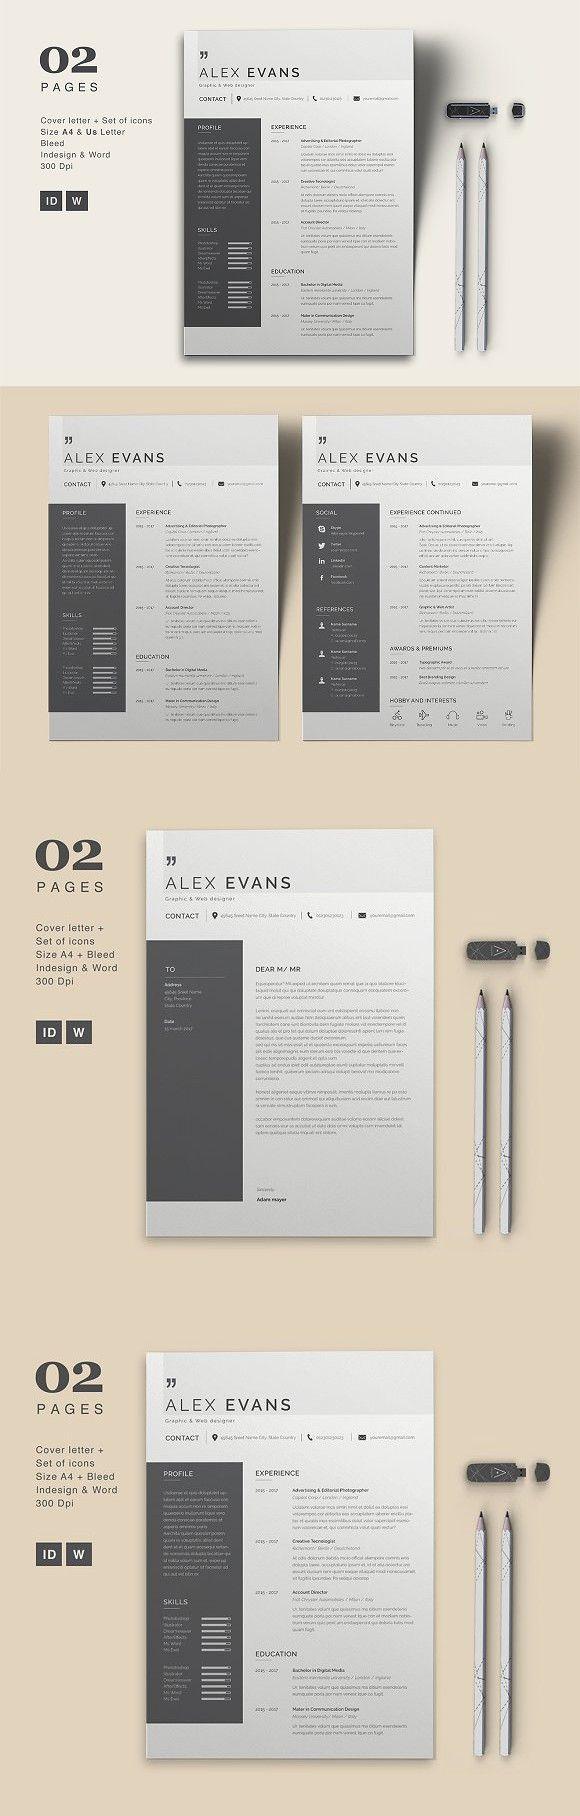 Resume Alex 70 best Work images on